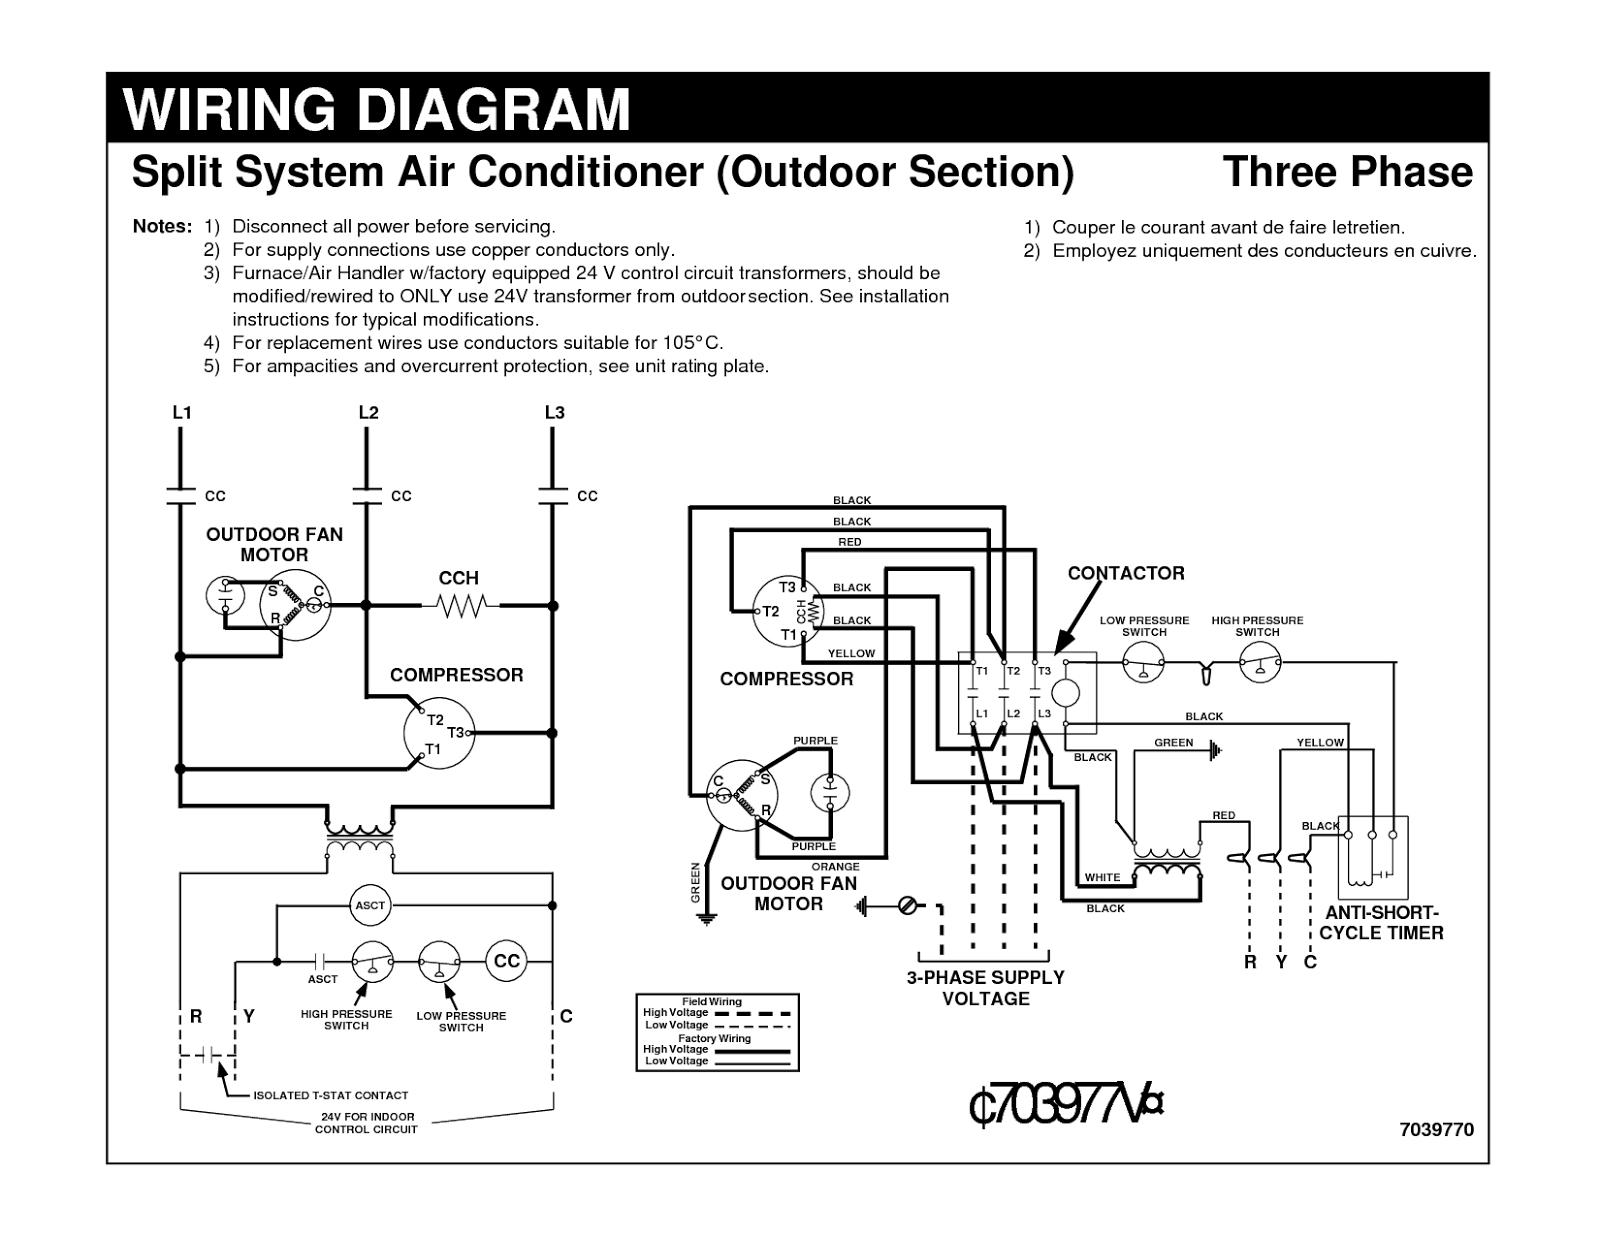 Ac Wire Diagram   Wiring Diagram - Air Conditioner Wiring Diagram Pdf